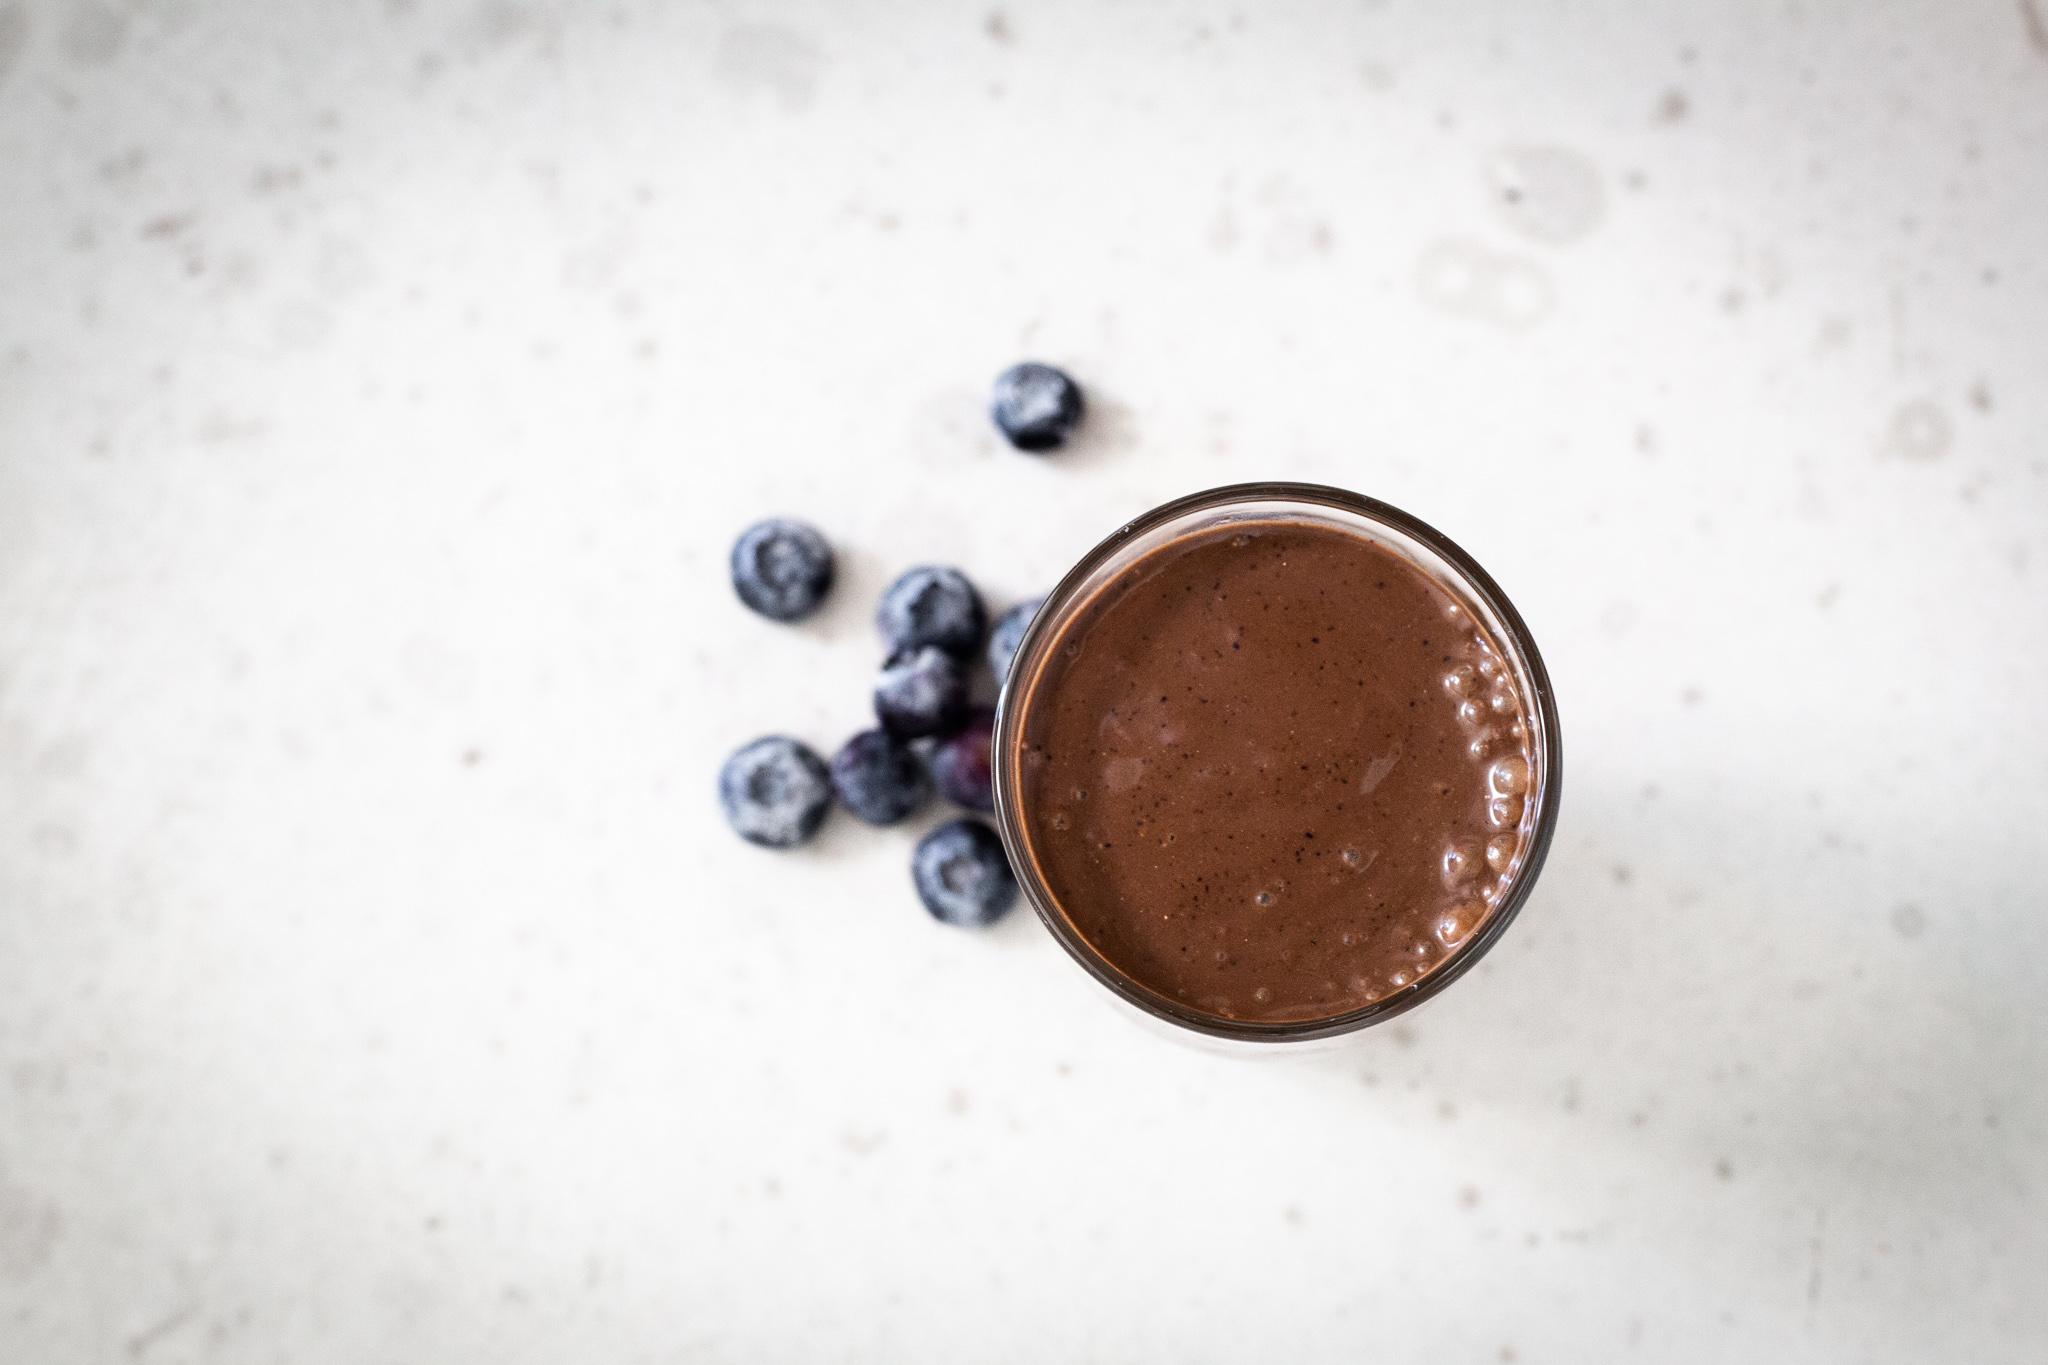 Chocolate Blueberry Smoothie